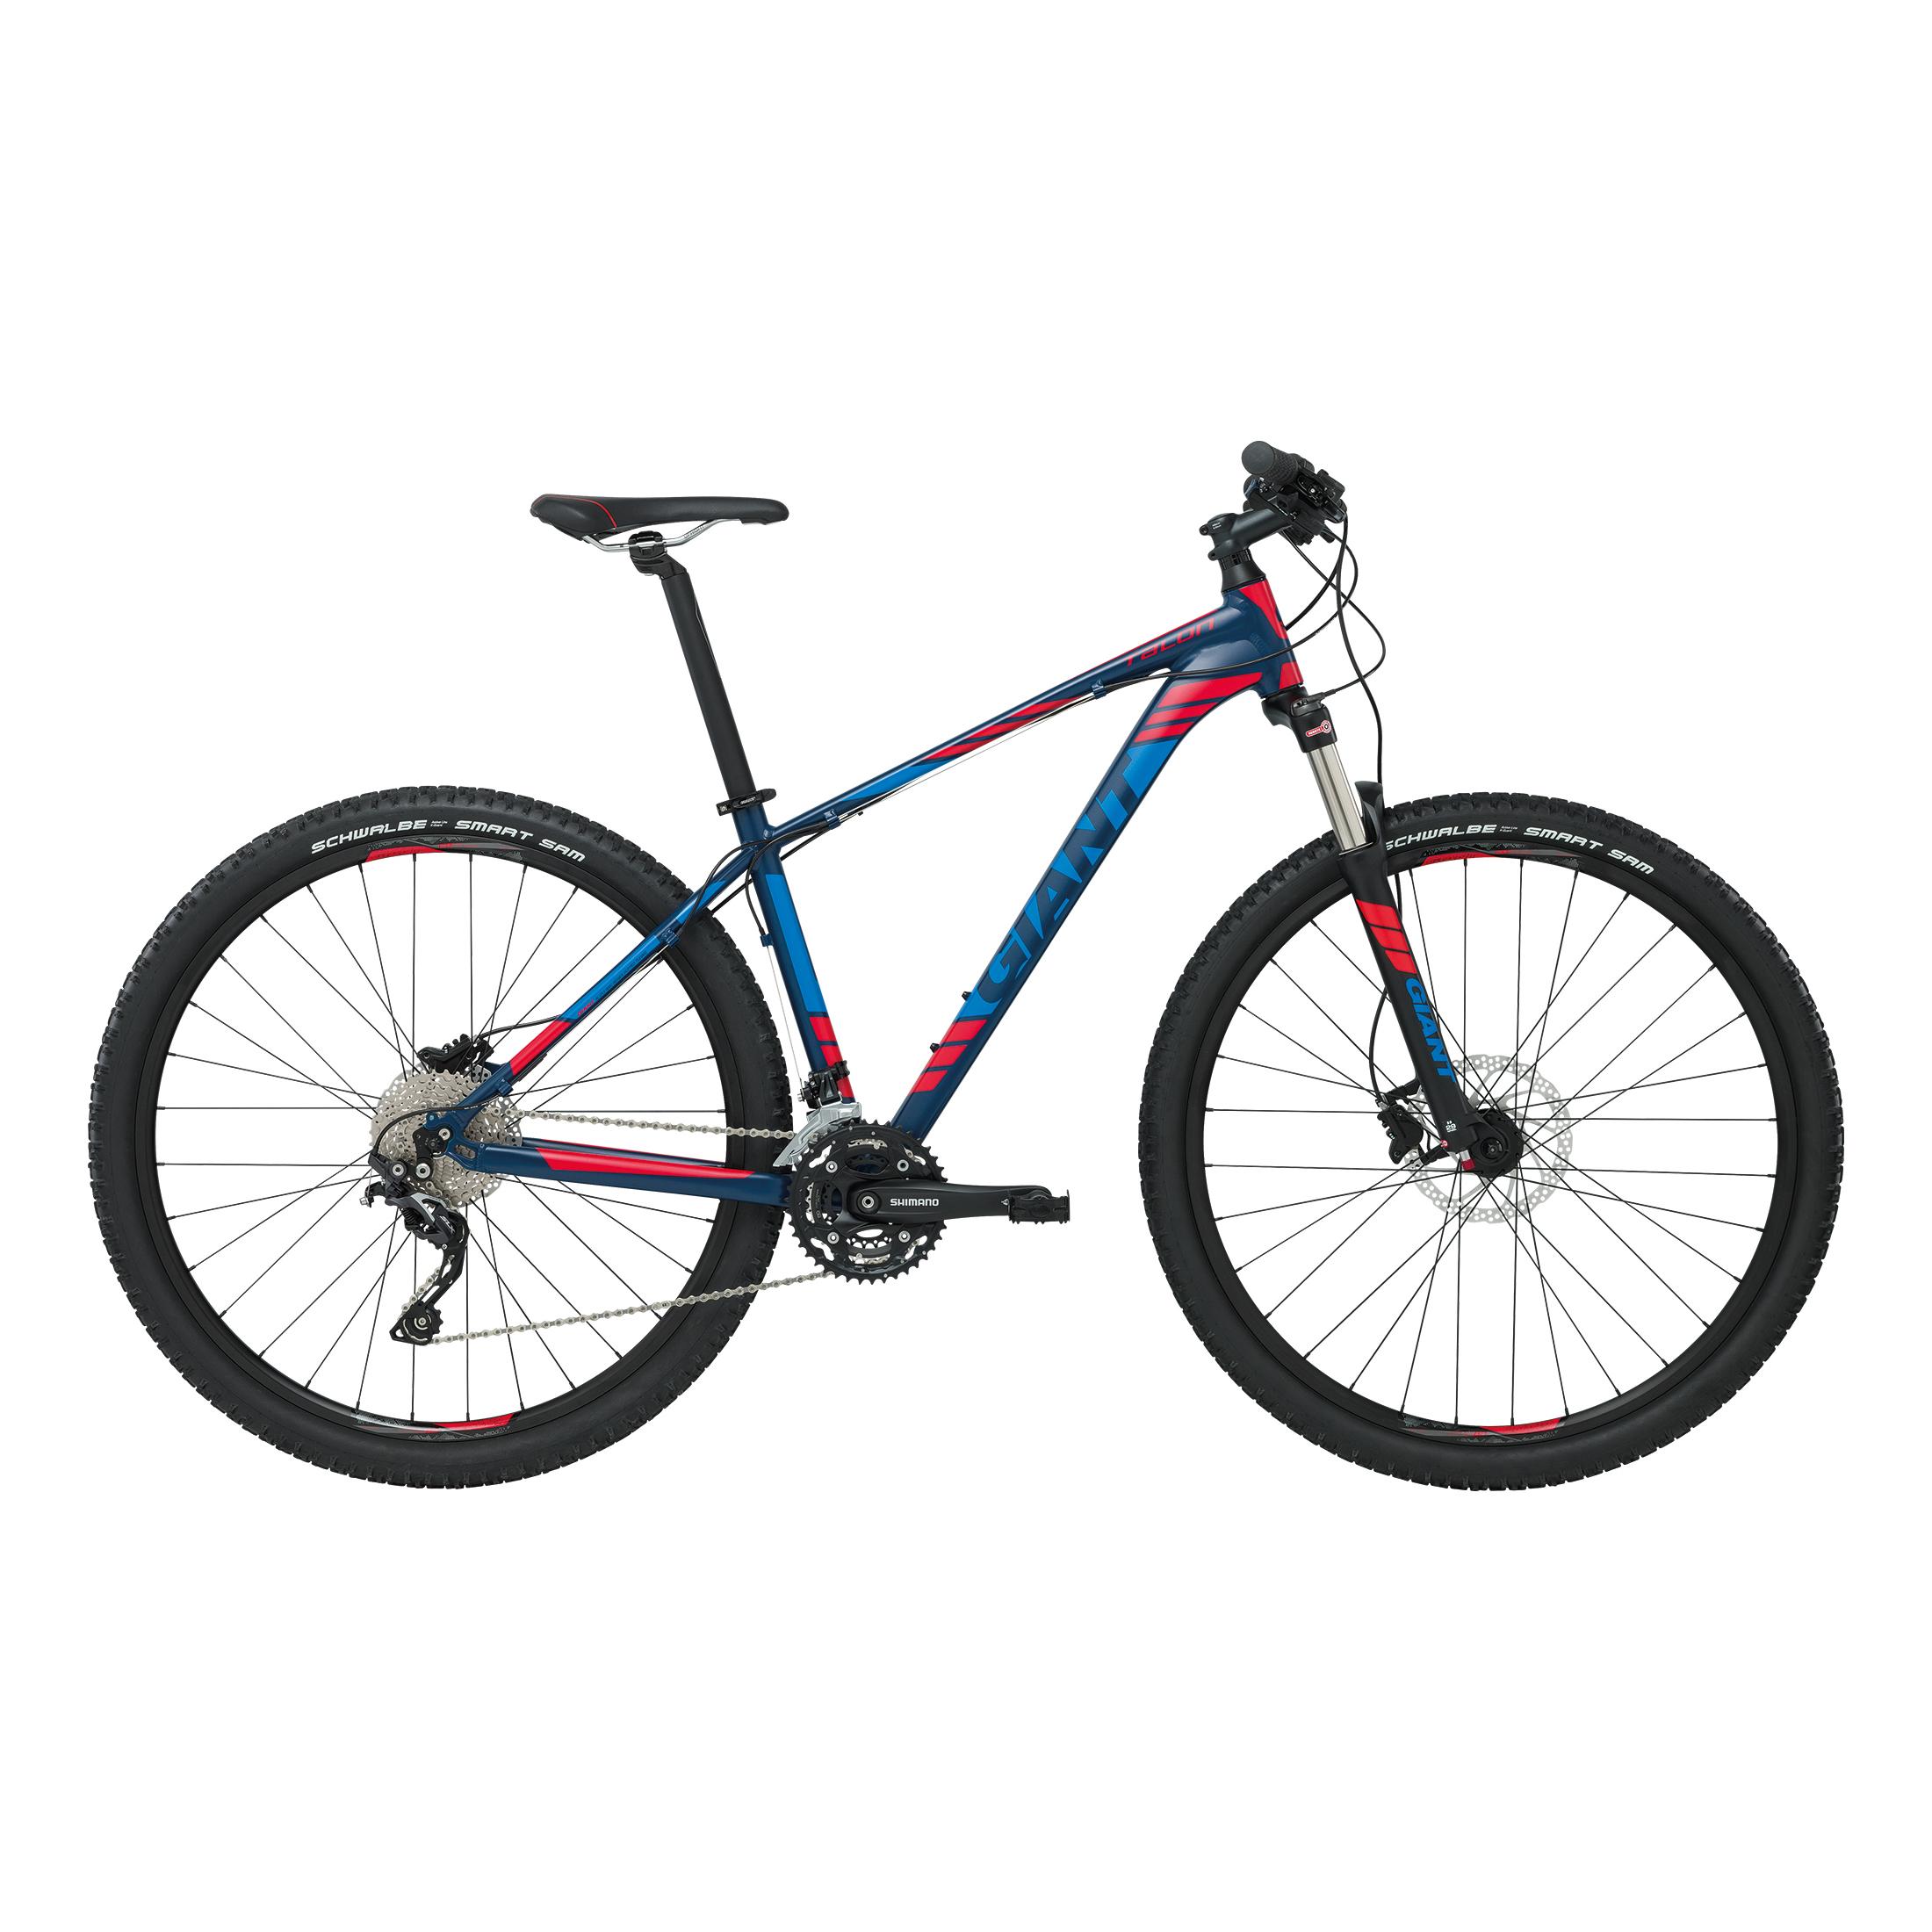 hardtail mountainbikes 29 bike mailorder. Black Bedroom Furniture Sets. Home Design Ideas